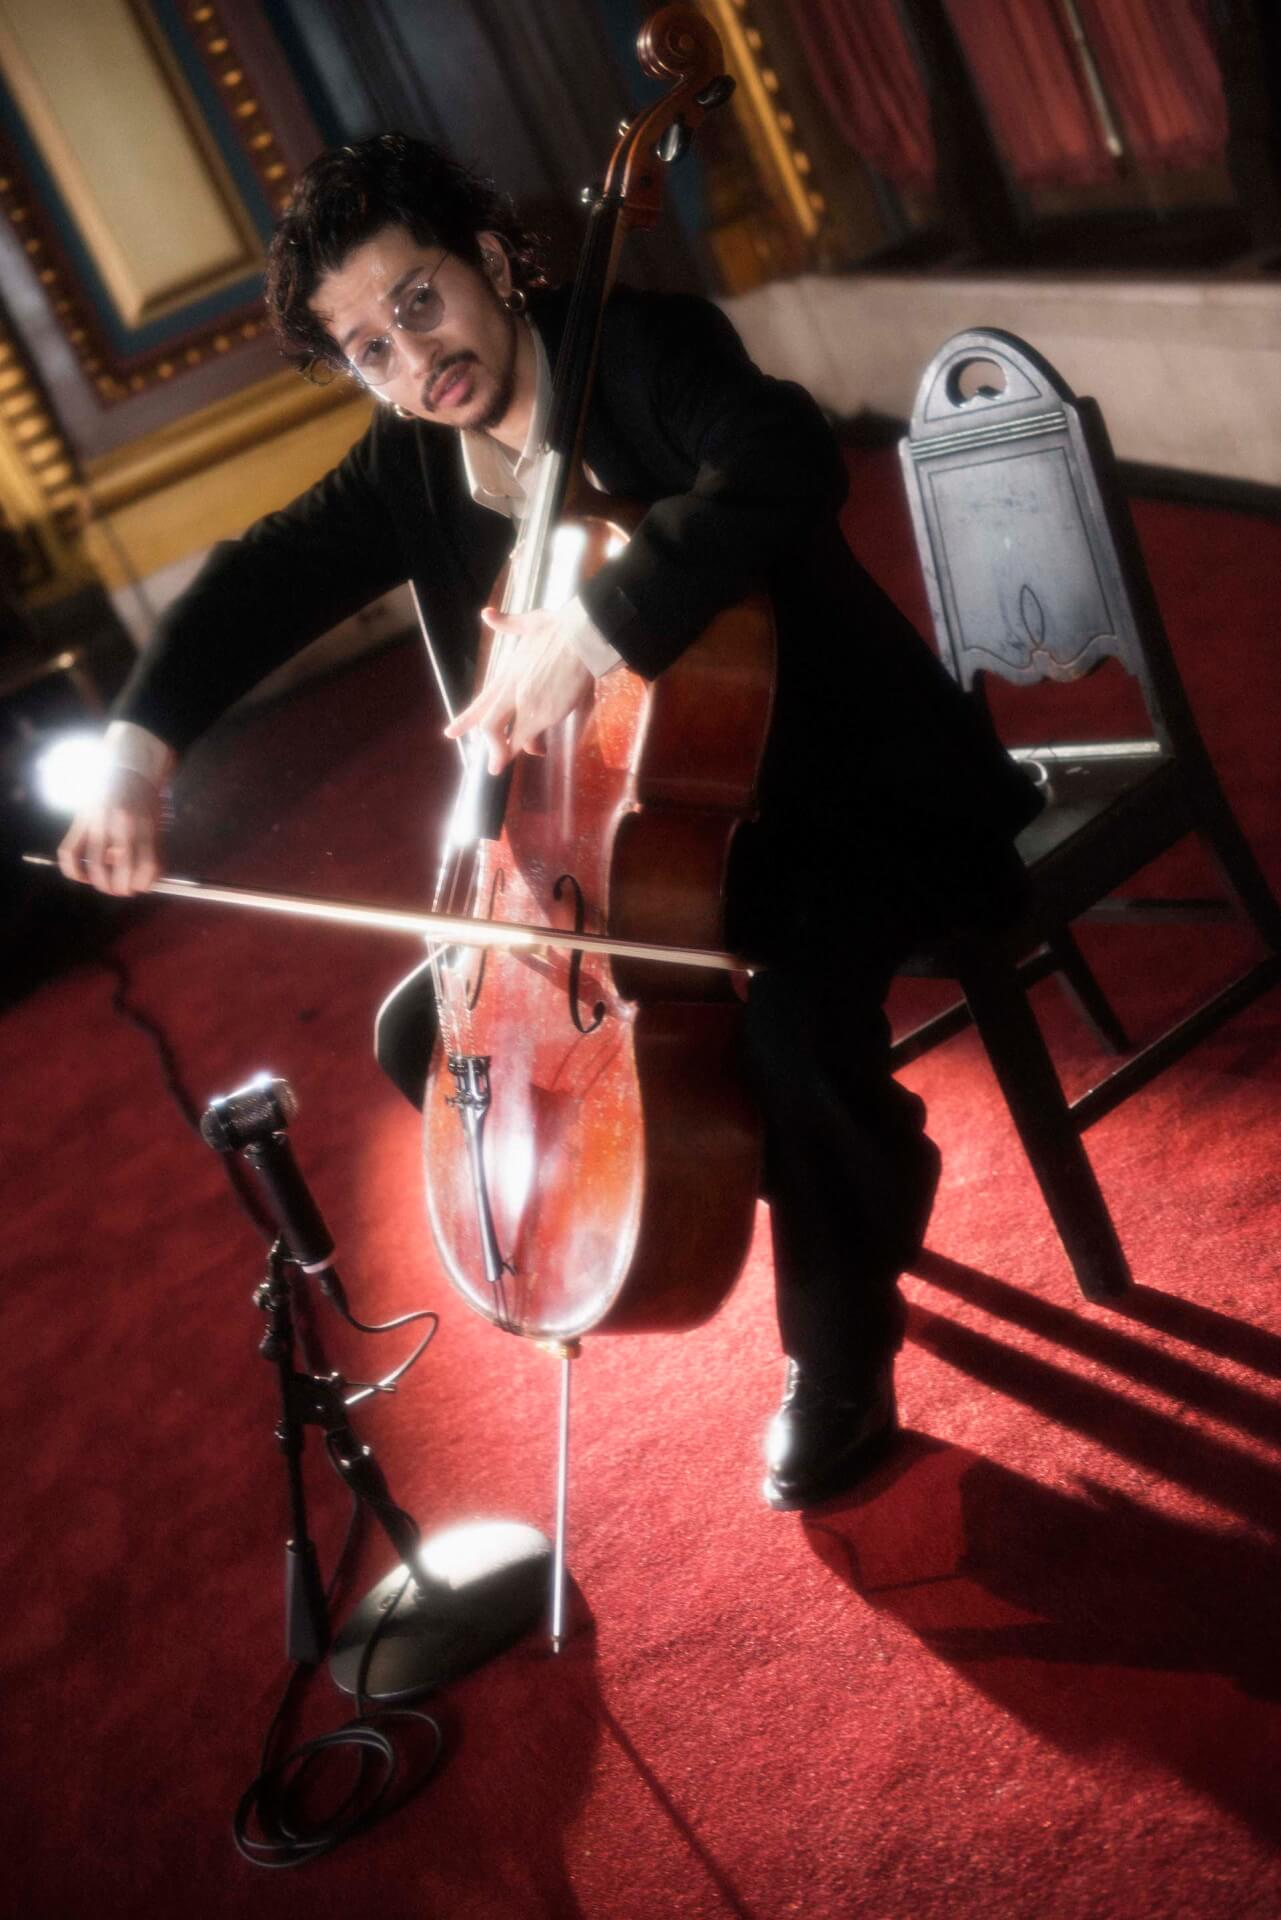 King Gnu常田大希、ニューヨークで開催されたN.HOOLYWOODのコレクションでチェロを生披露 music200205_tsunetadaiki_5